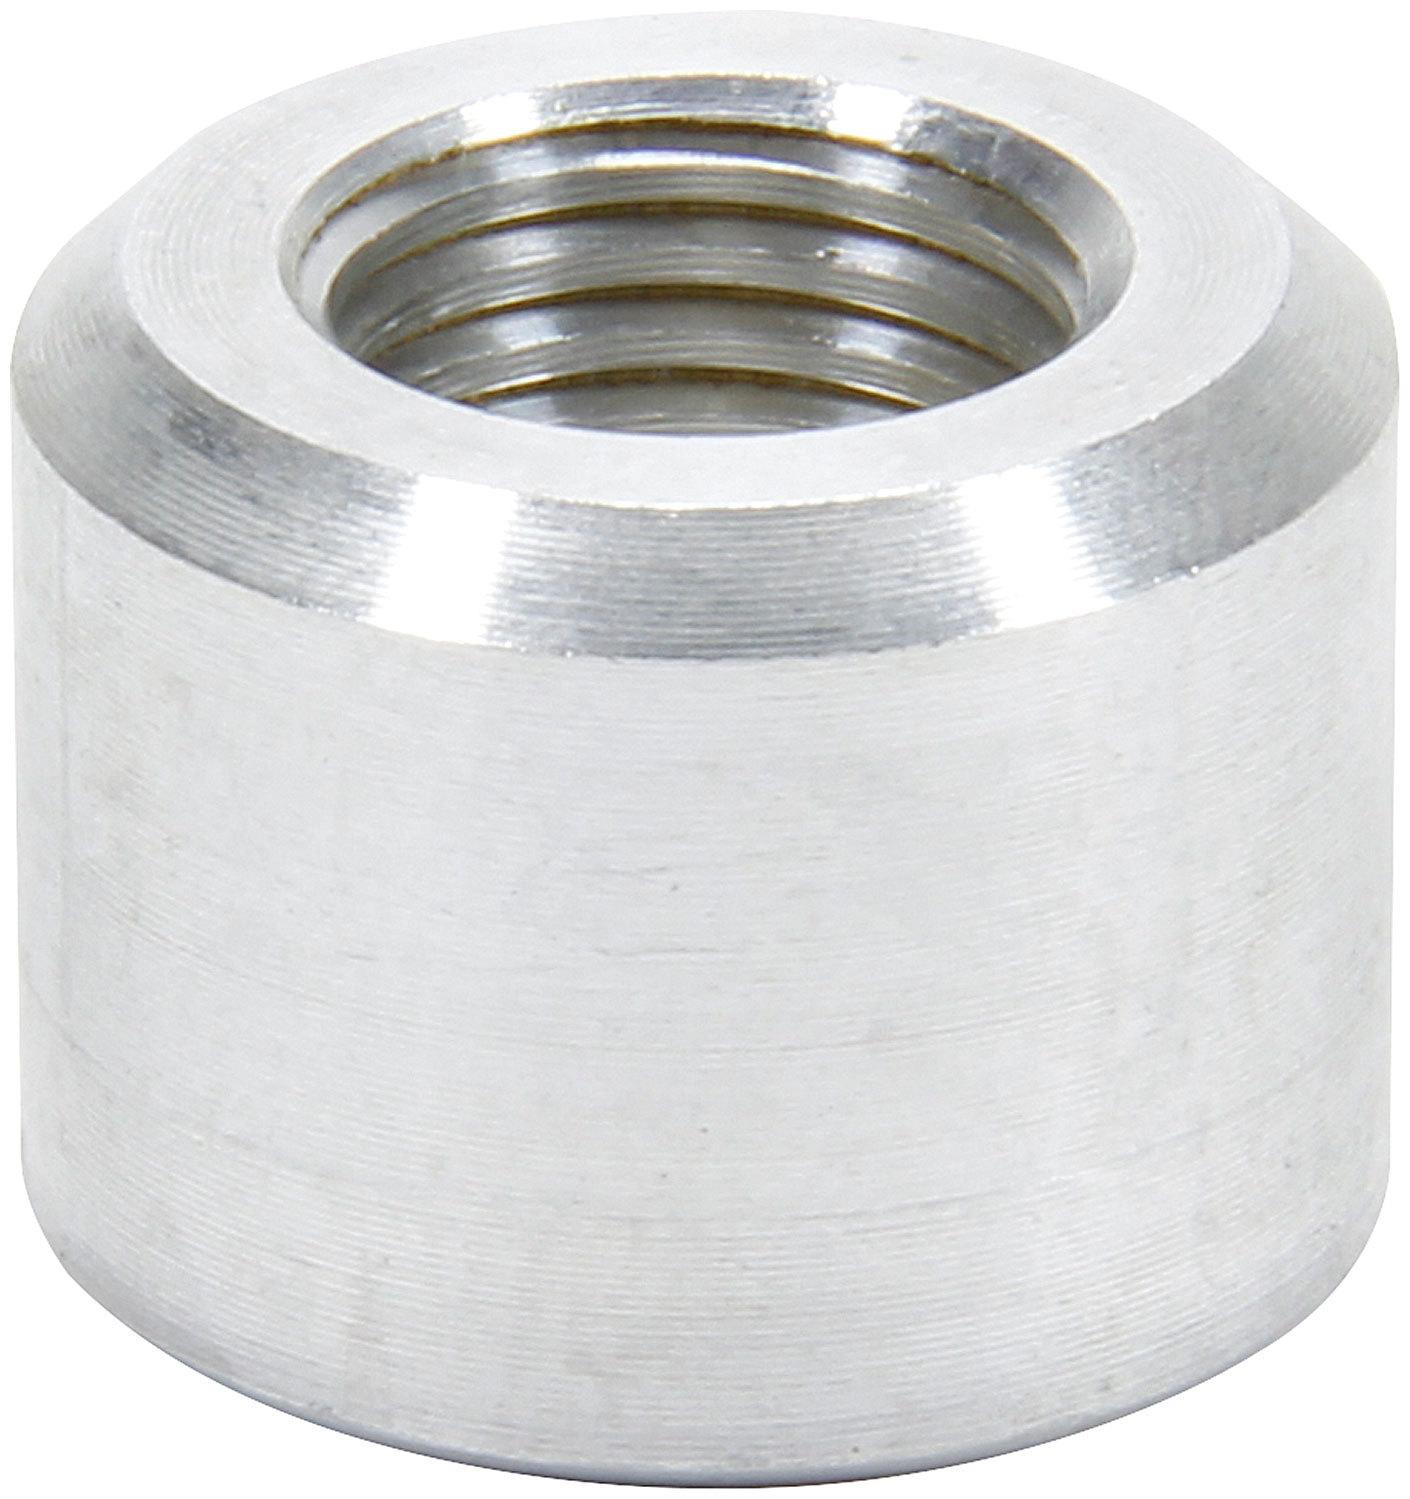 Allstar Performance 50780 Bung, 4 AN Female O-Ring, Weld-On, Aluminum, Natural, Each